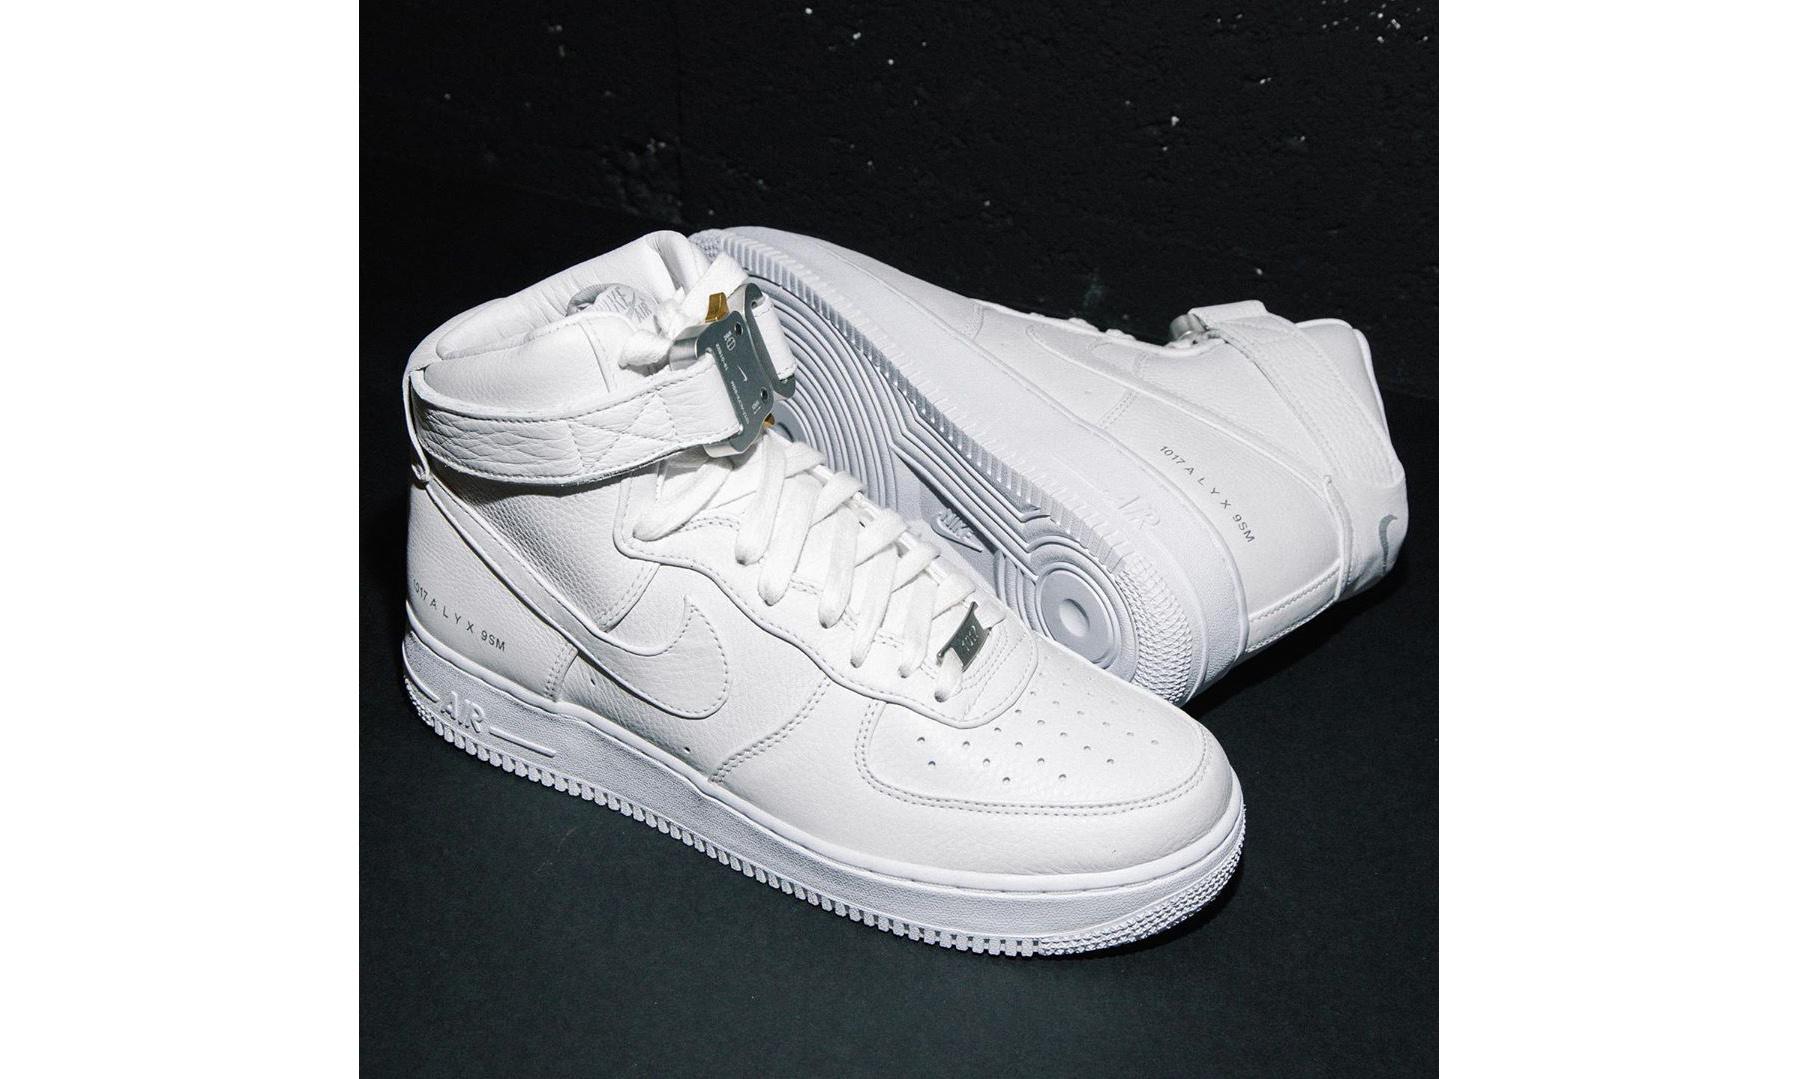 1017 ALYX 9SM x Nike Air Force 1 将于今日限时发售